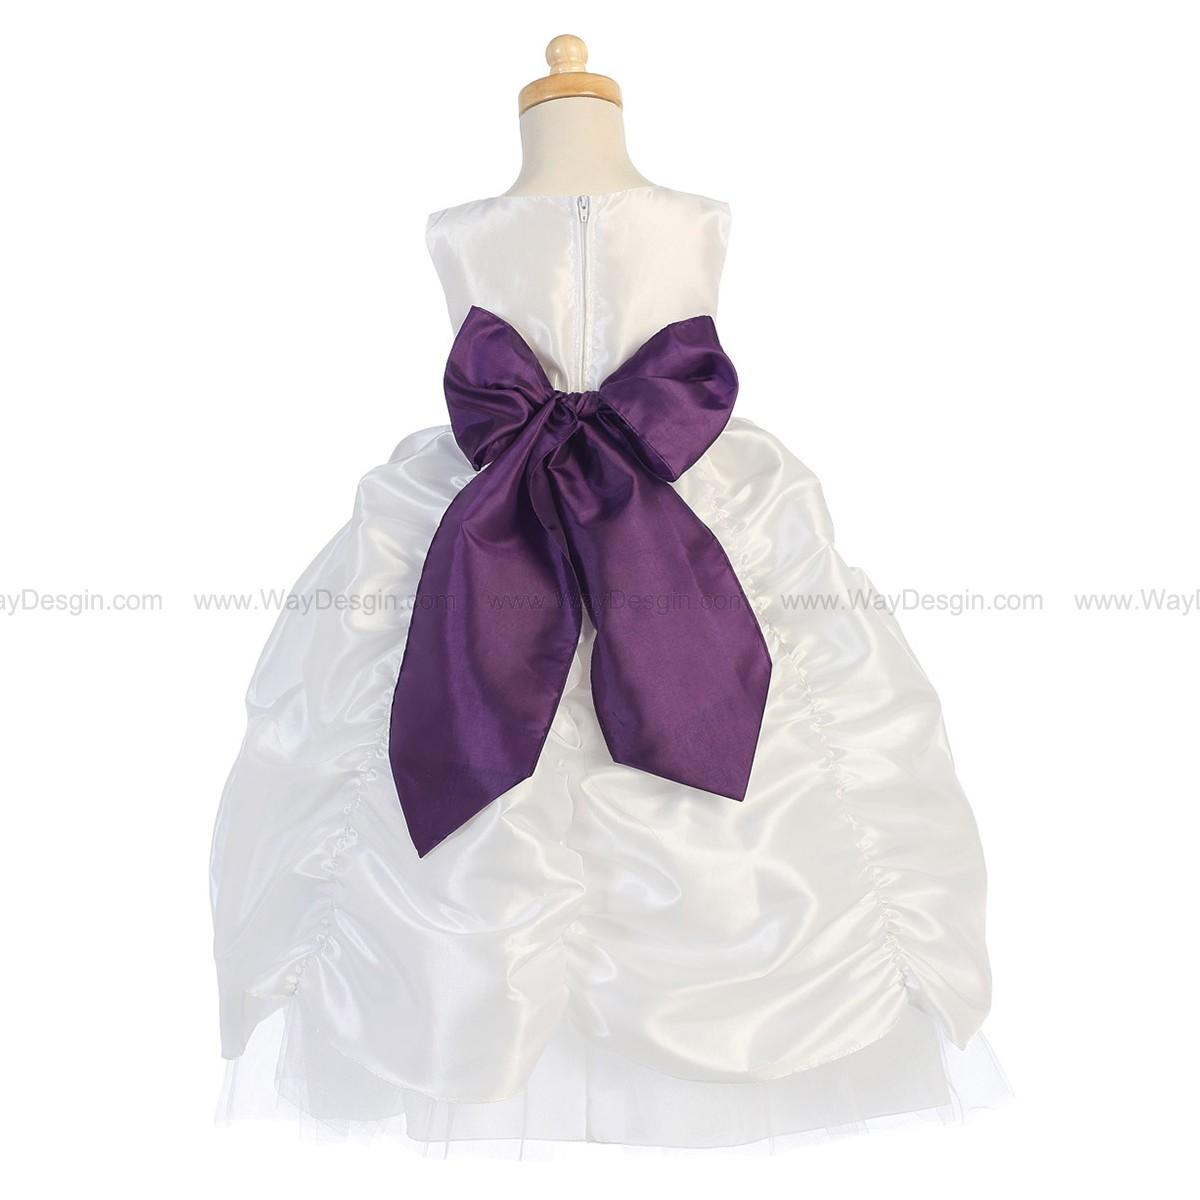 Blossom White Taffeta Dress Shirred Skirt and Detachable Sash & Flower